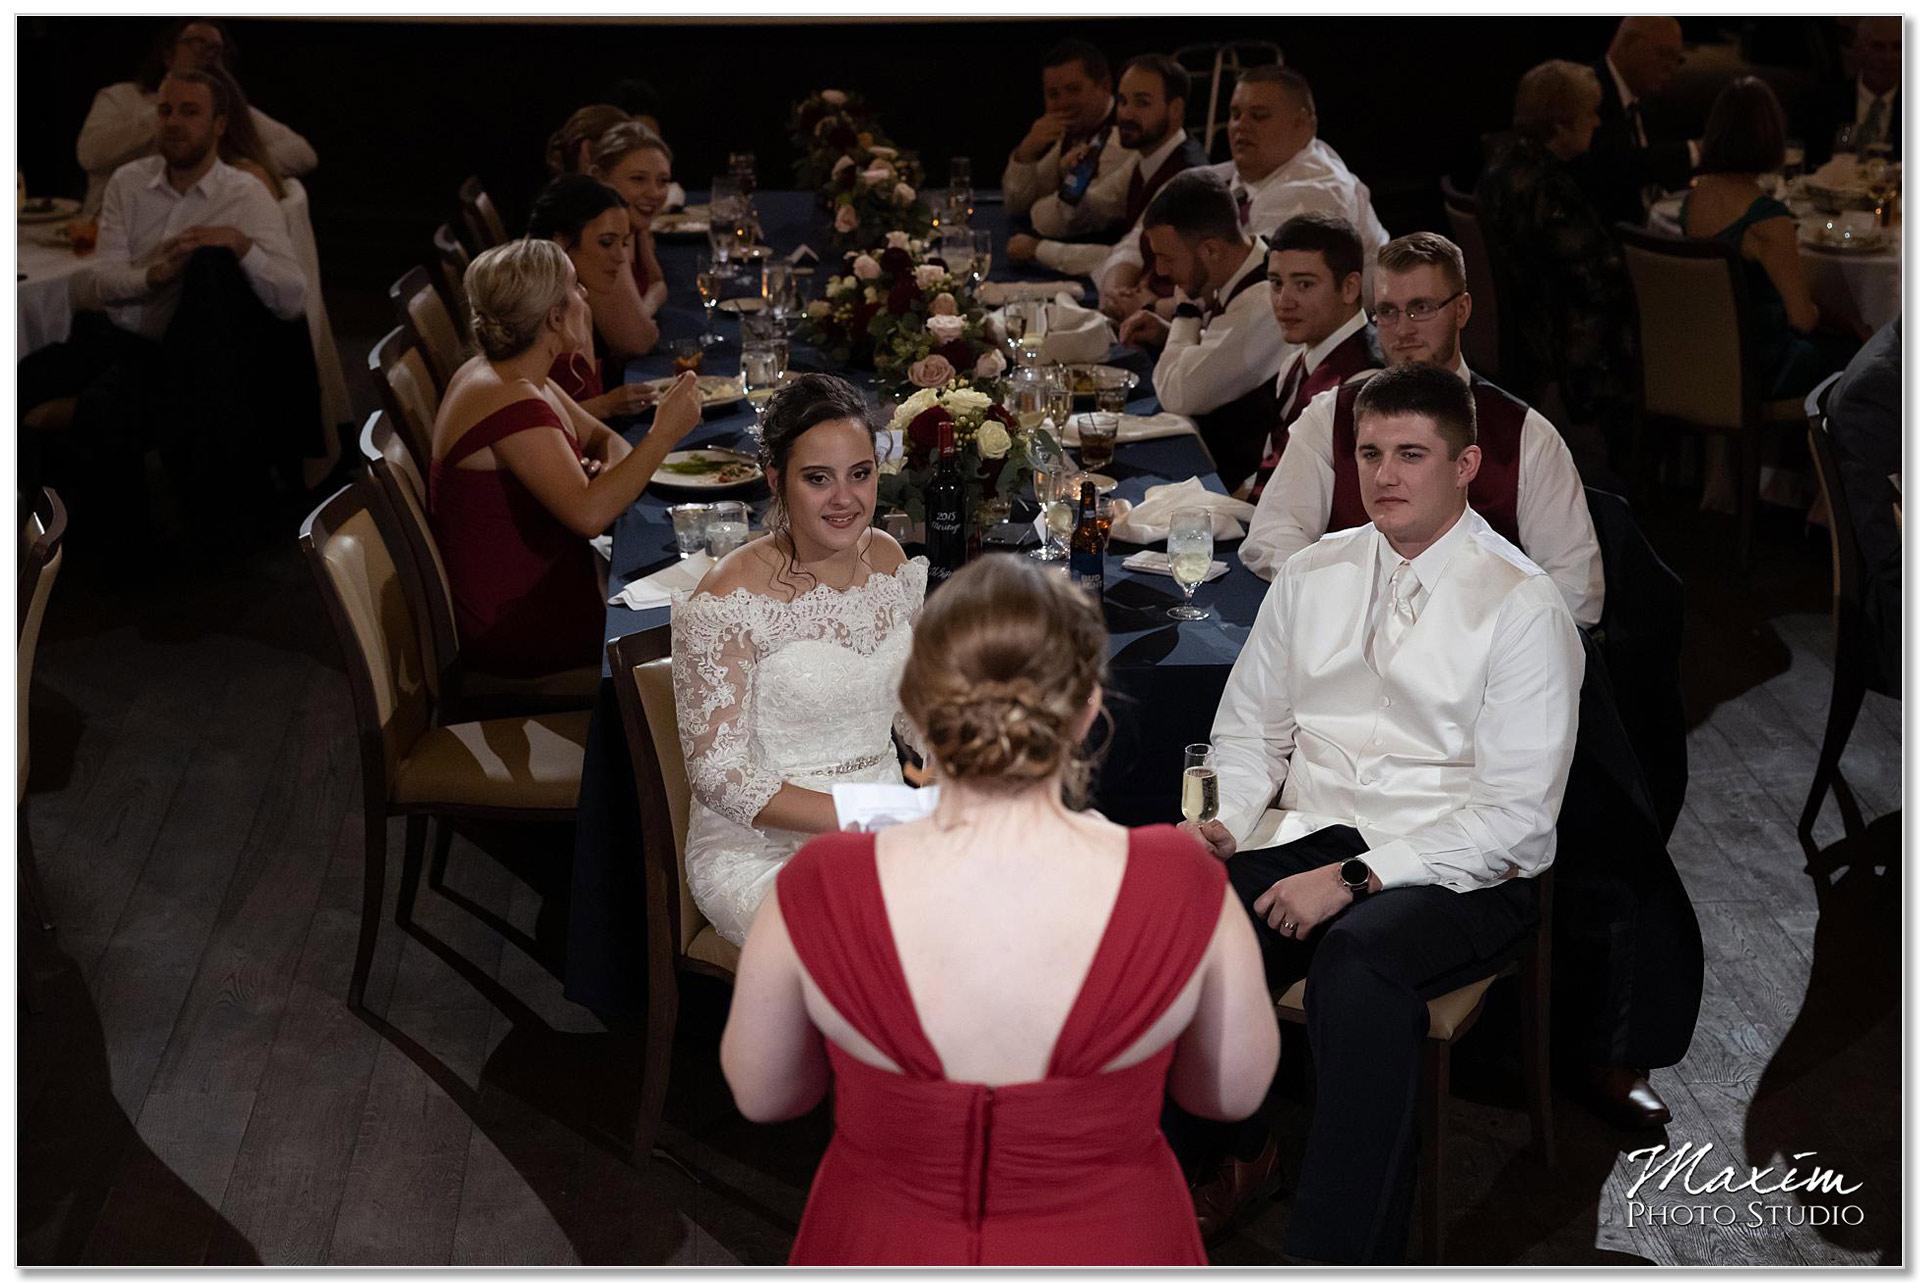 The Transept wedding reception bridesmaid toast